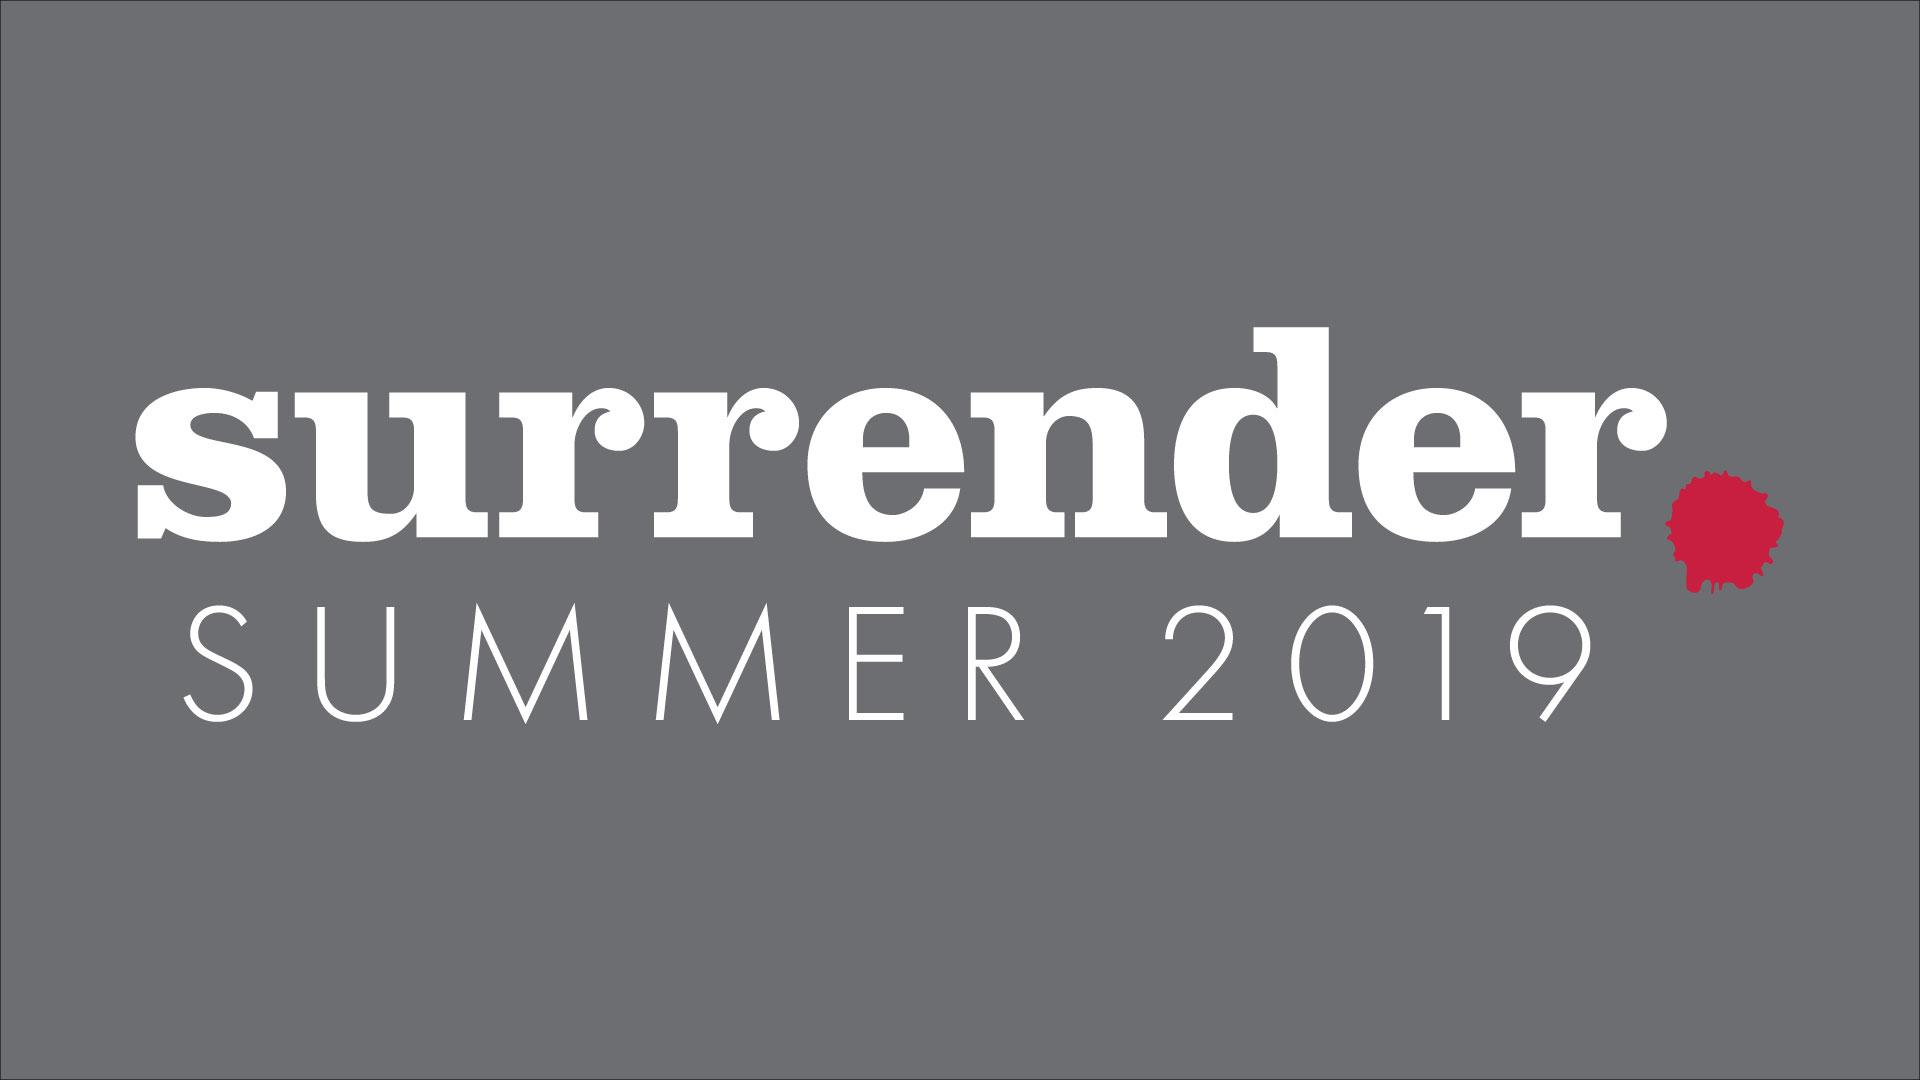 Surrender-summer-2019.jpg